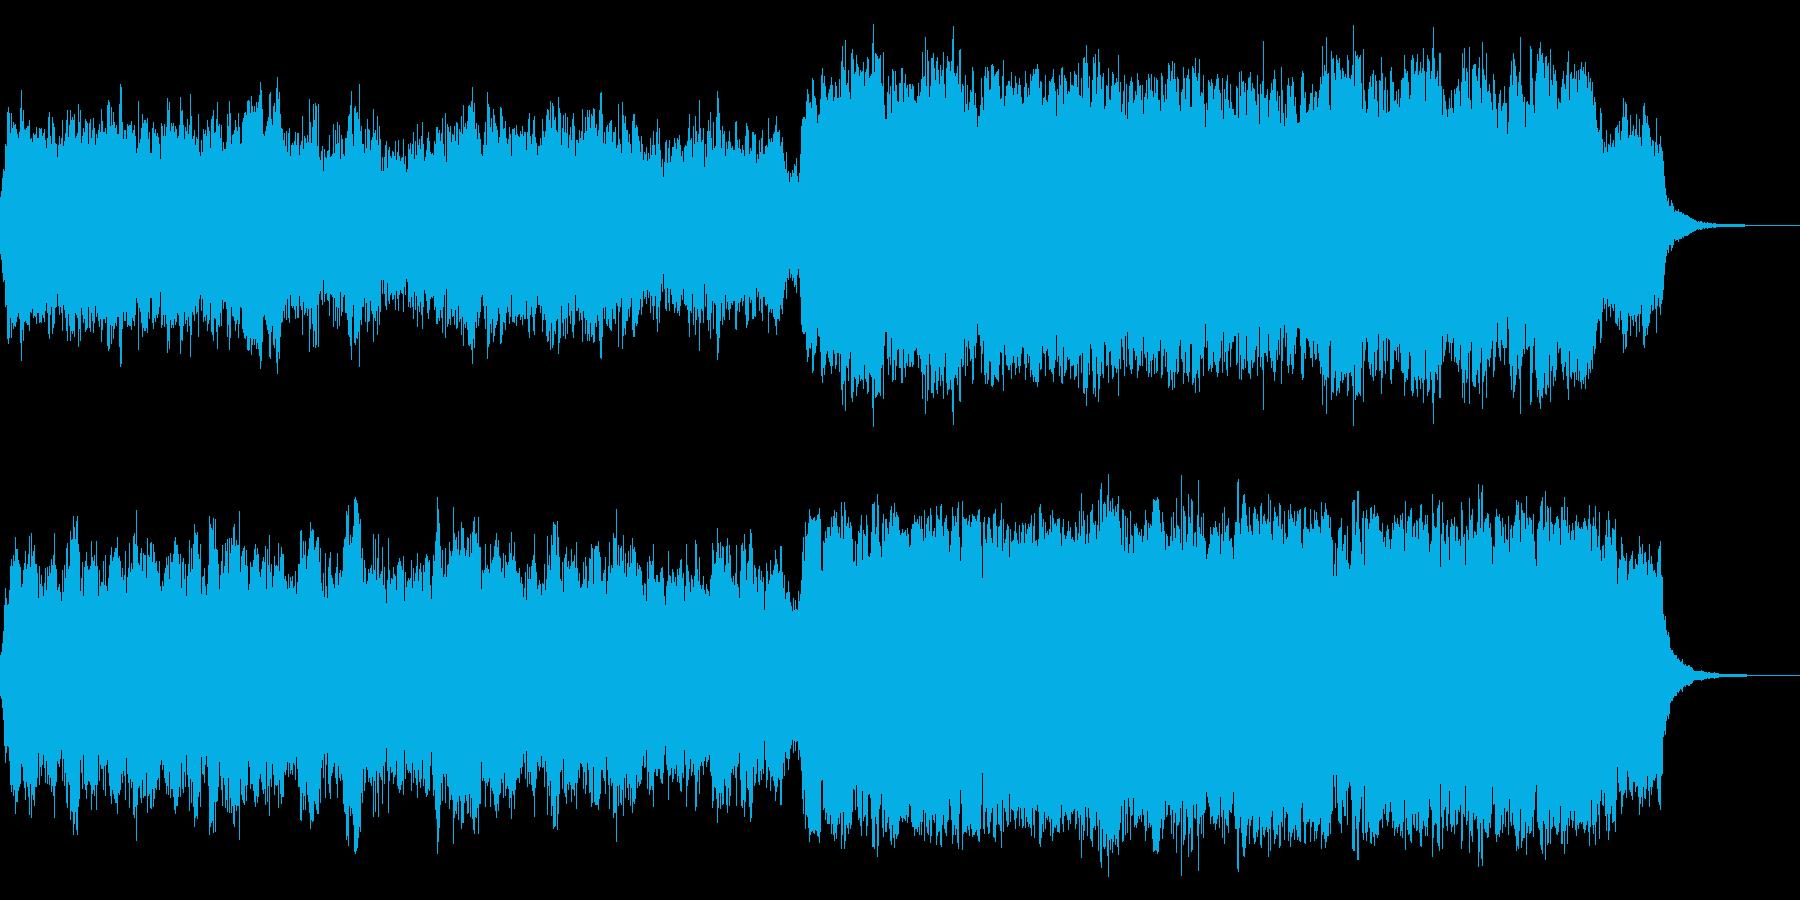 SAKURA by Hollywoodの再生済みの波形